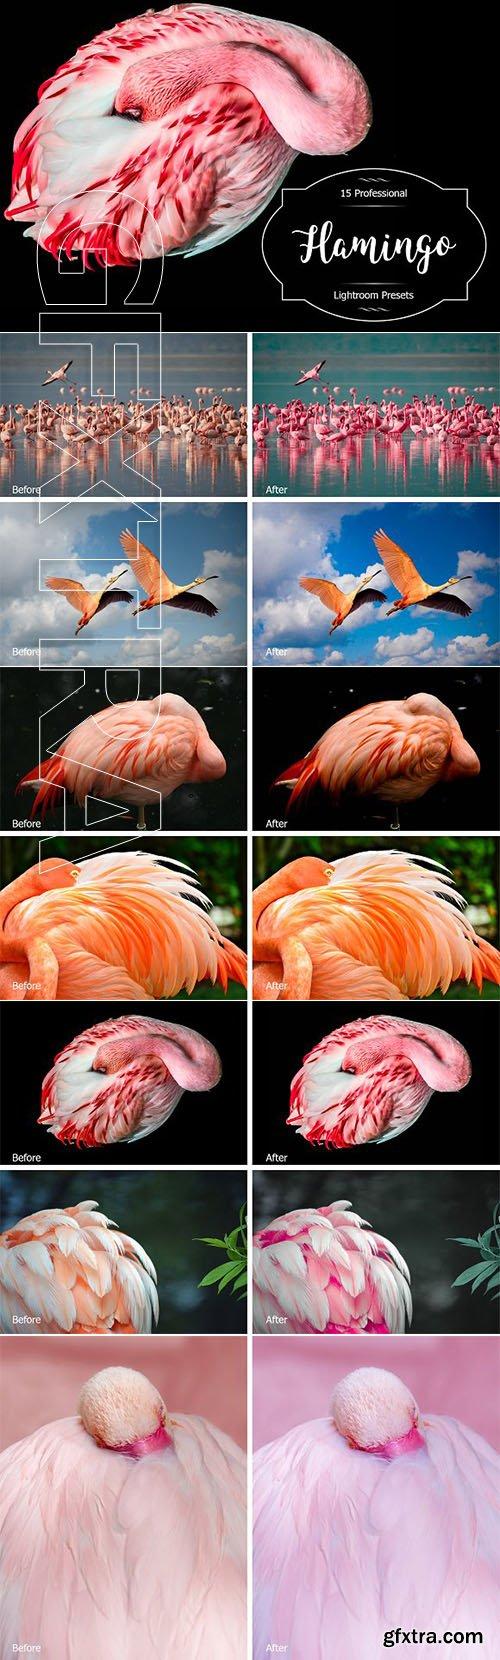 CreativeMarket - Flamingo Lr Presets 2941375